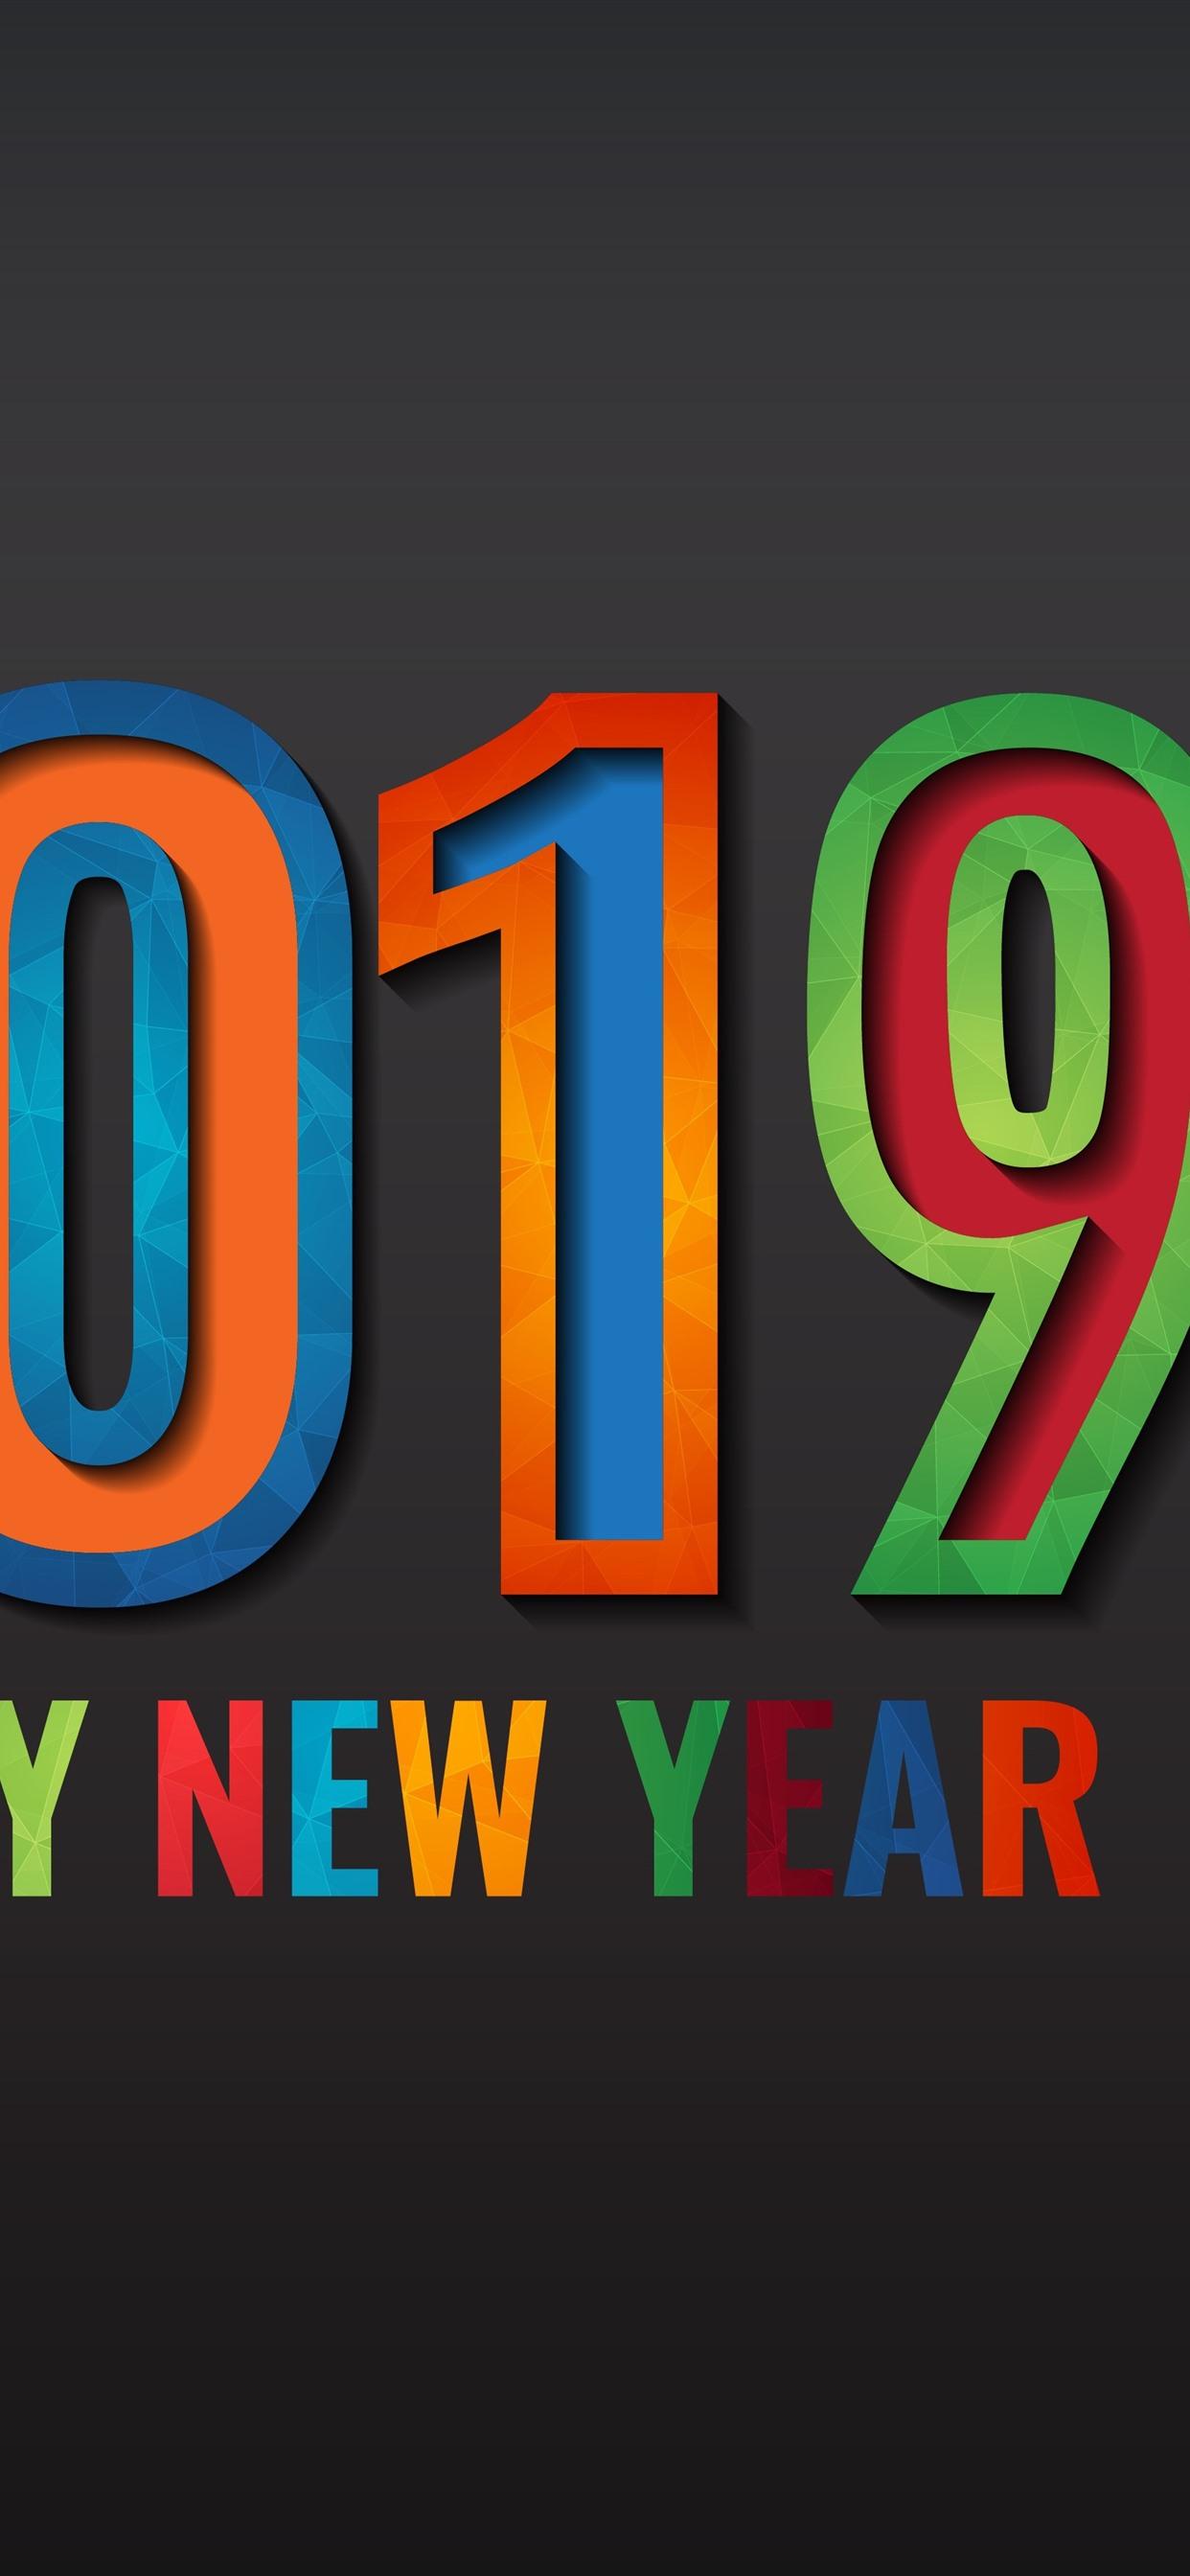 Happy New Year 2019 1242x2688 Iphone Xs Max Wallpaper